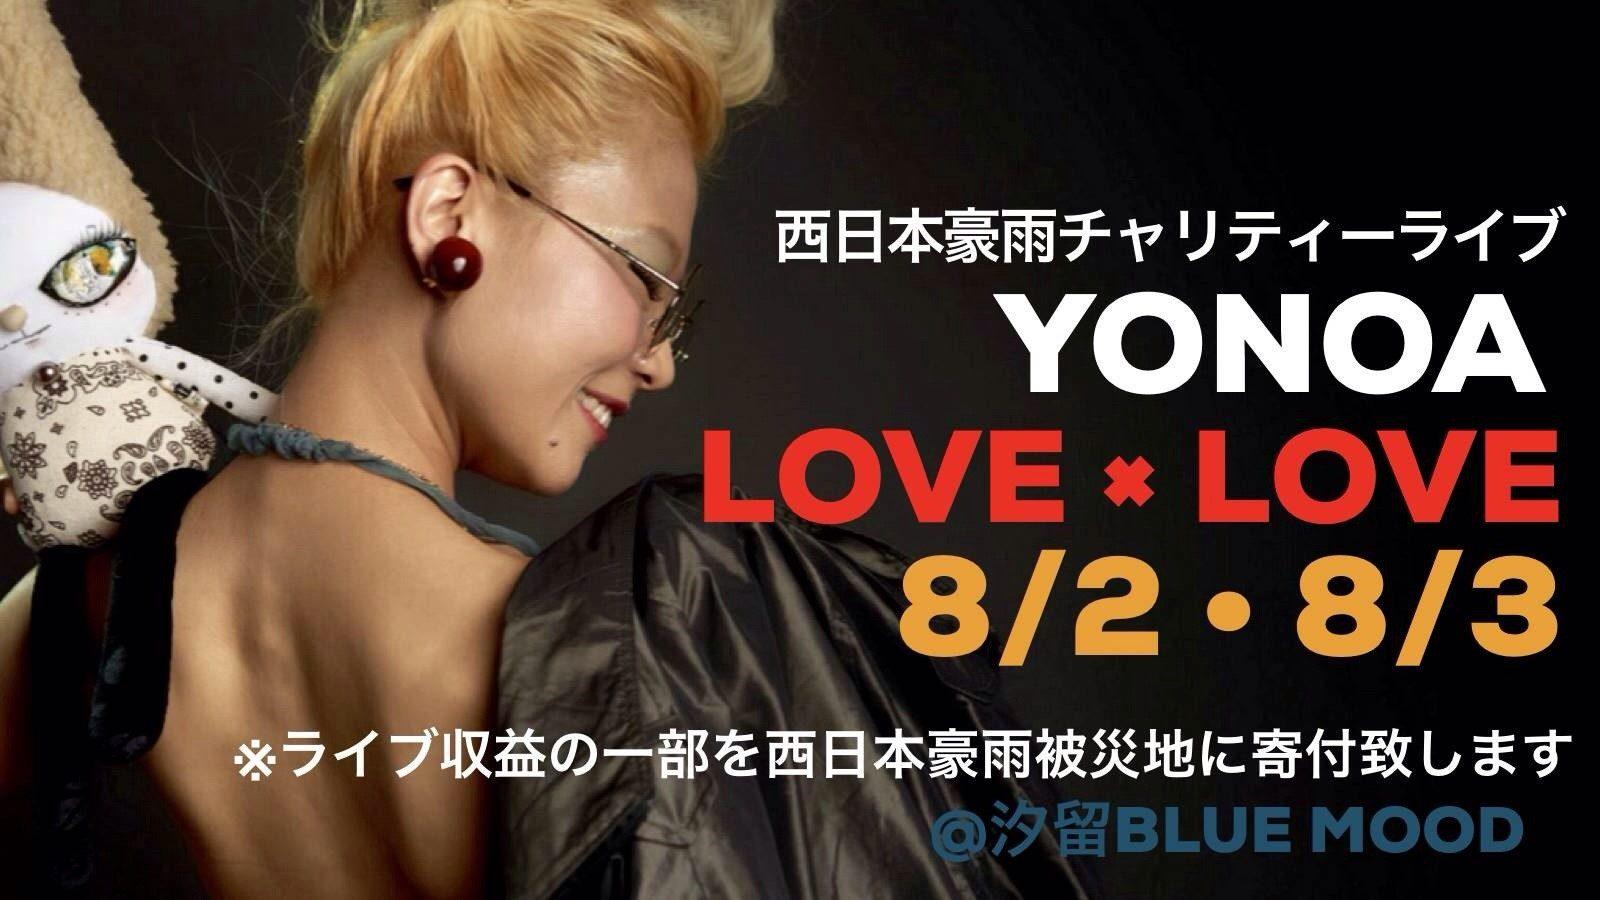 YONOA「LOVE×LOVE」Live ~西日本豪雨チャリティーライブ~